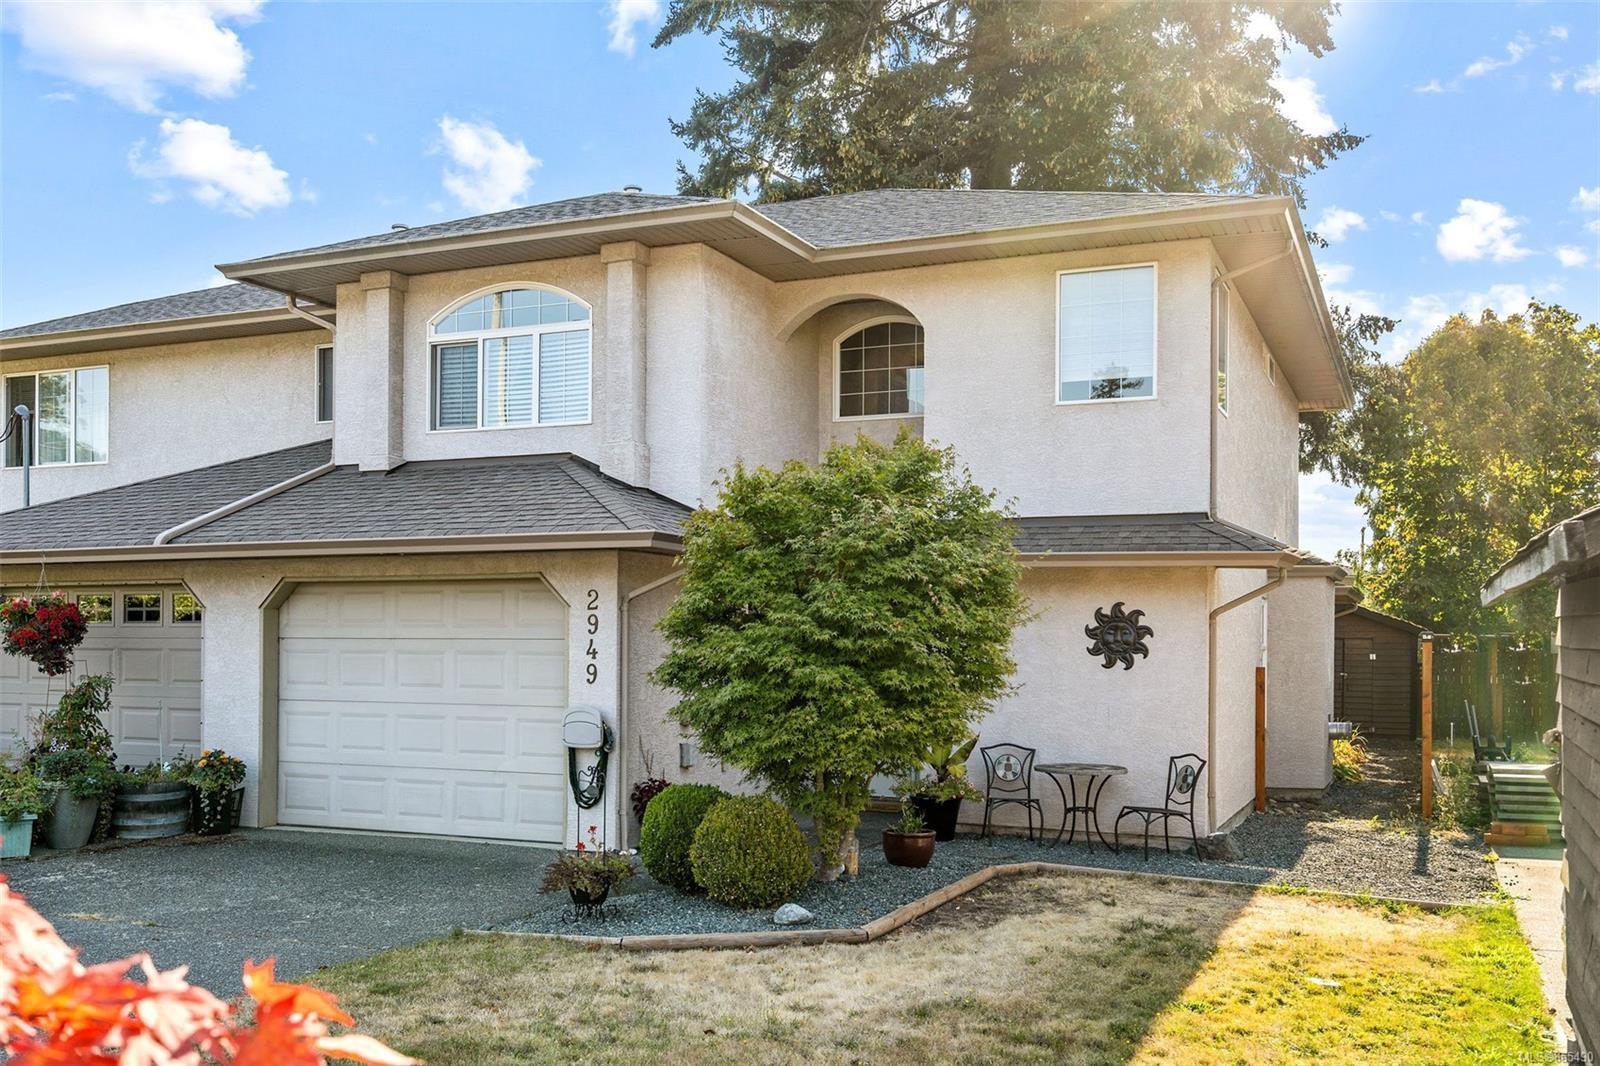 Main Photo: 2949 Robalee Pl in : La Goldstream Half Duplex for sale (Langford)  : MLS®# 855490